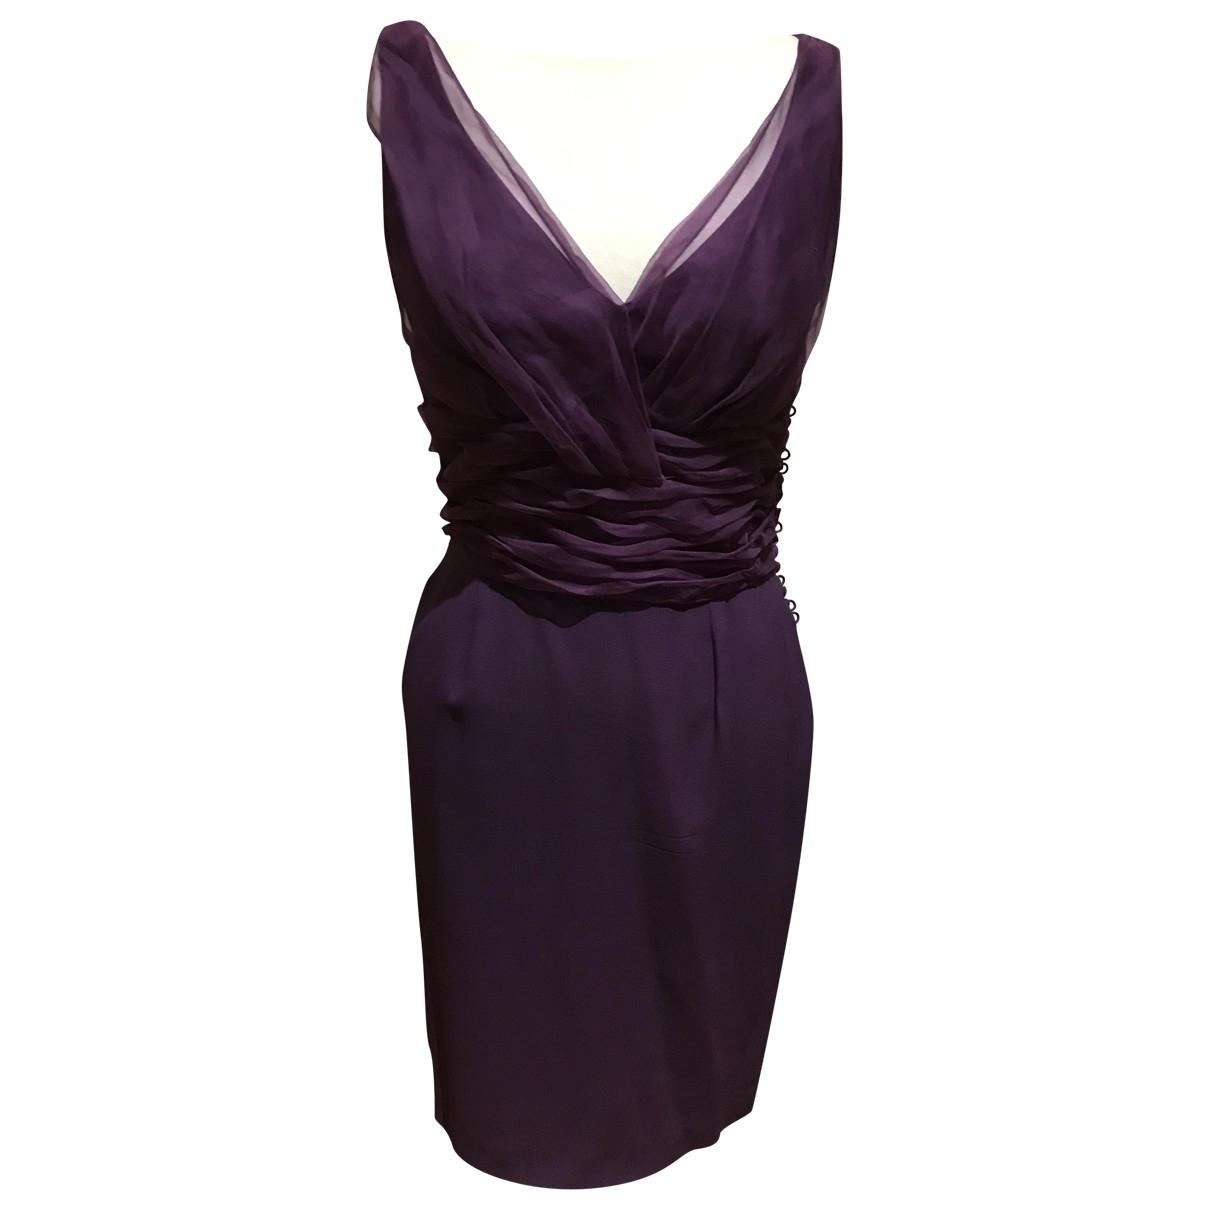 Dior \N Kleid in  Lila Seide